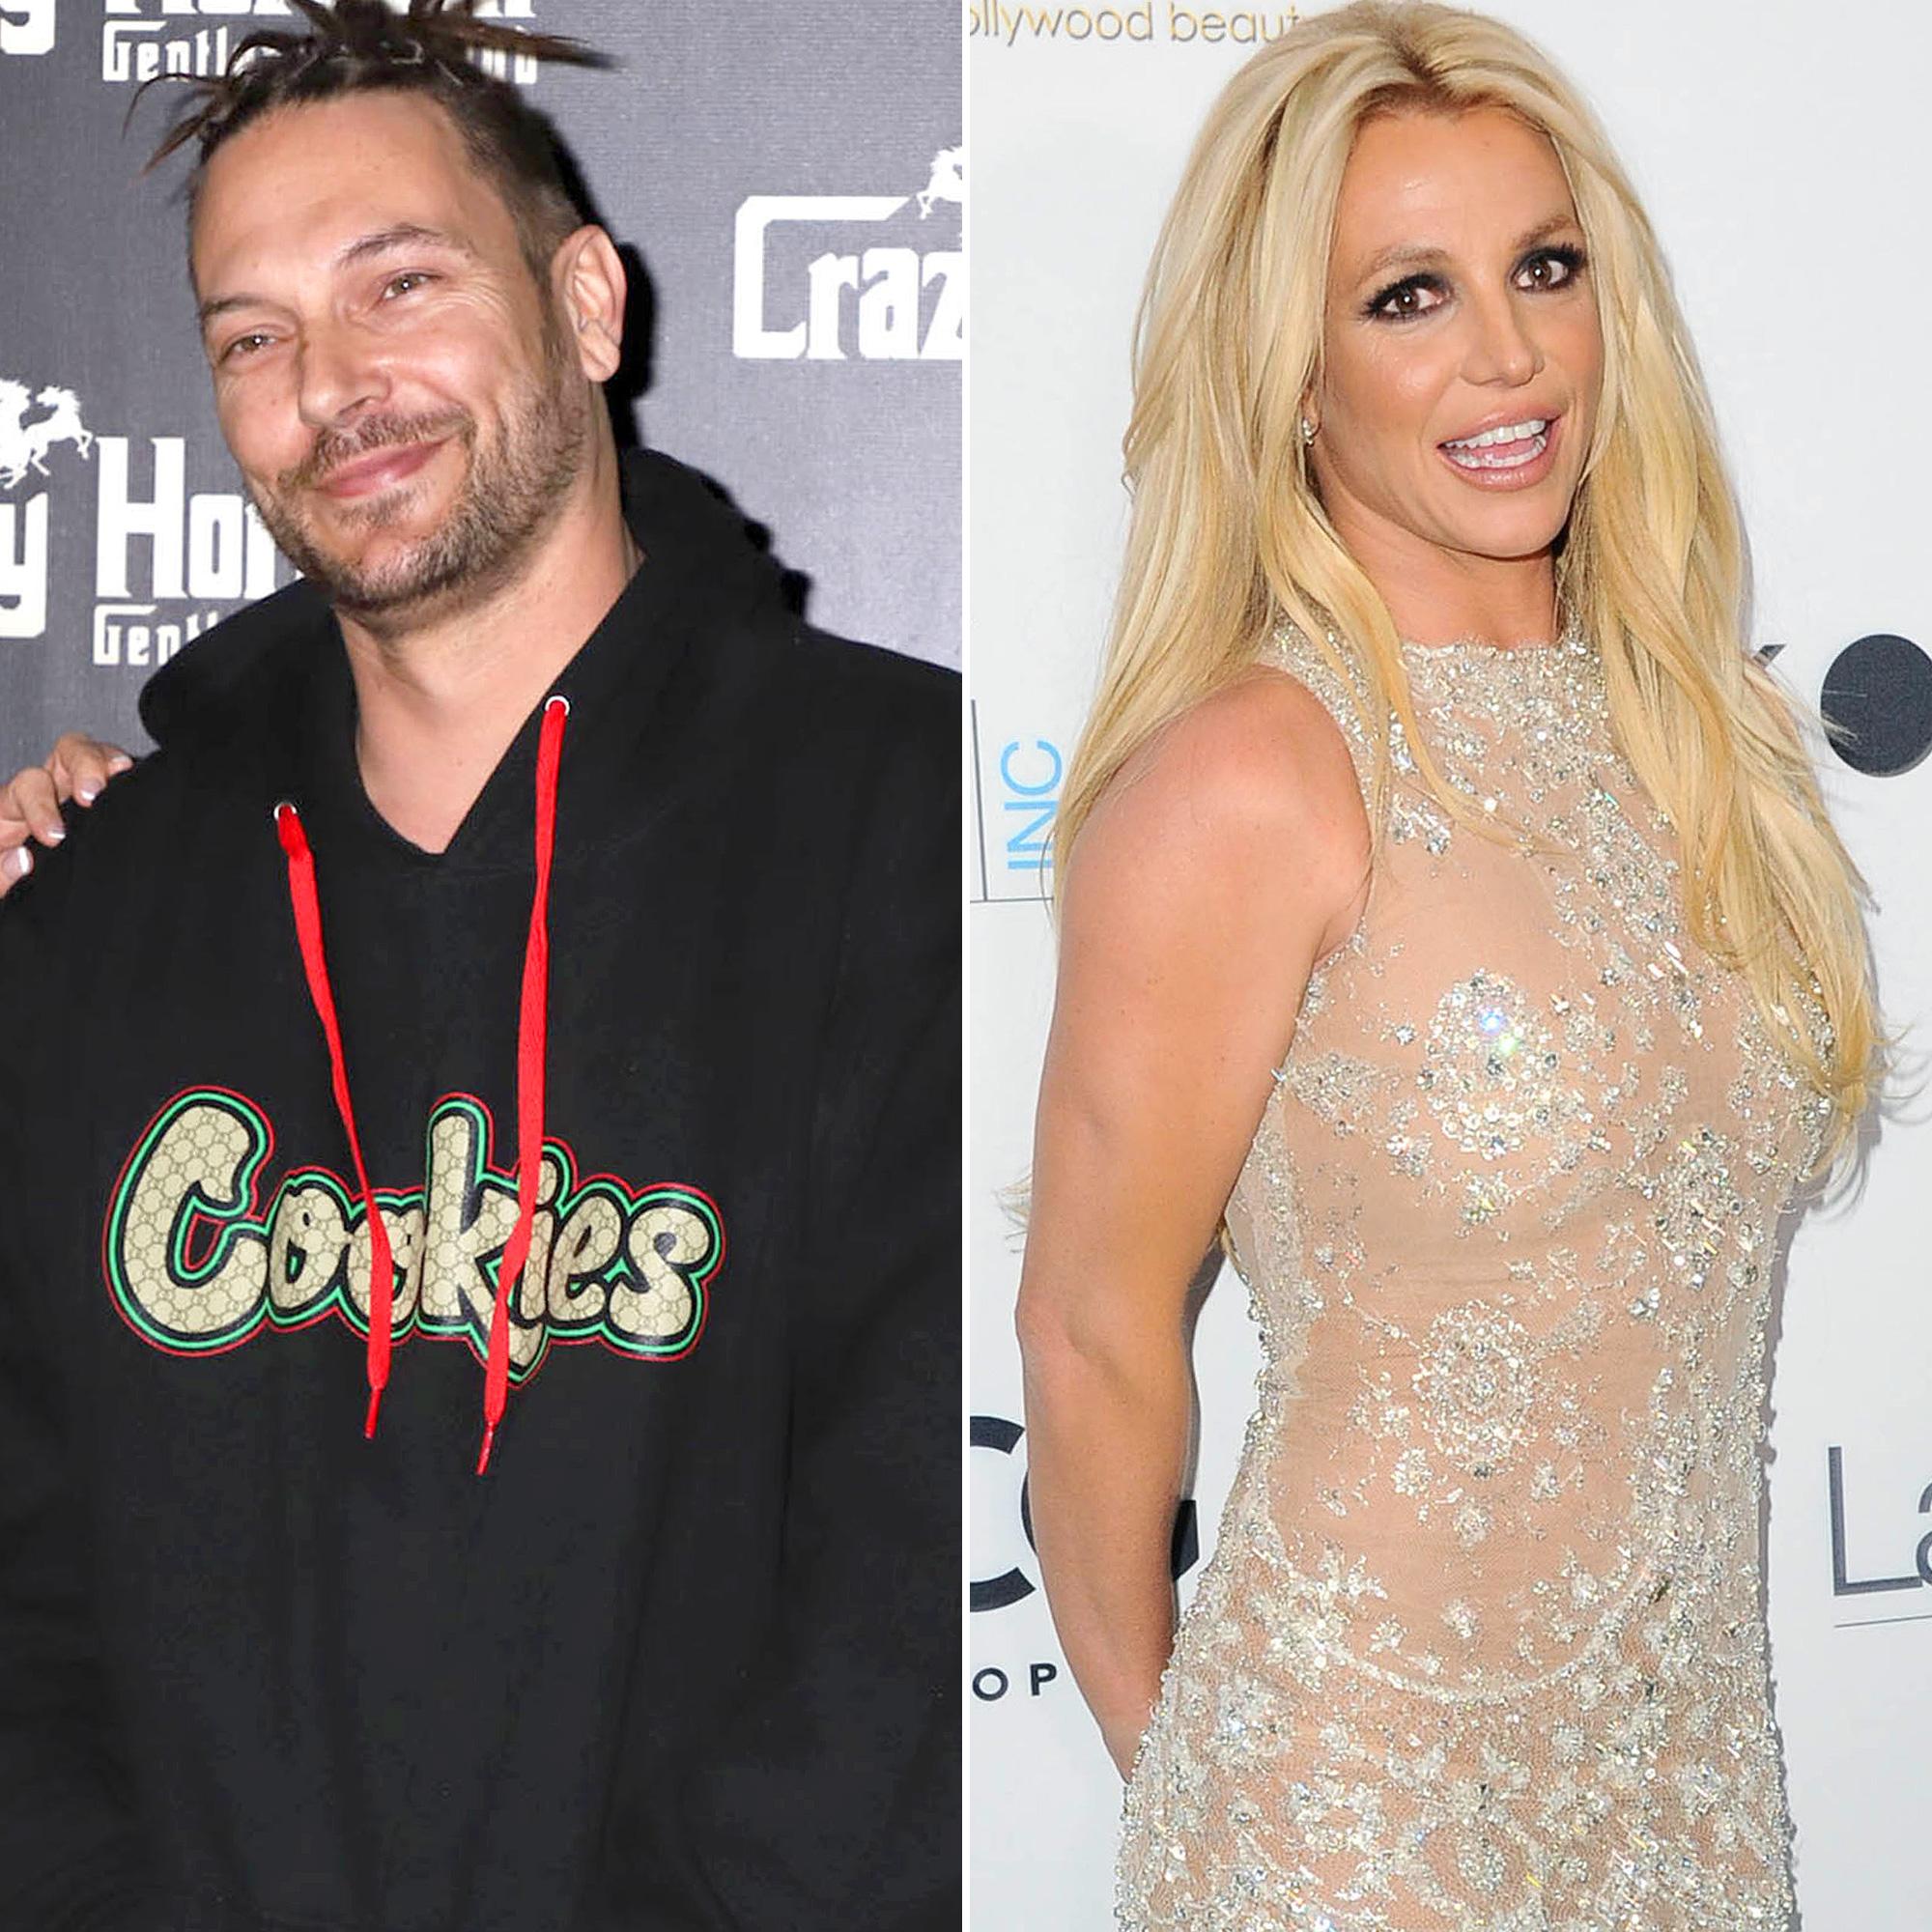 Britney Spears arrested over custodial dispute